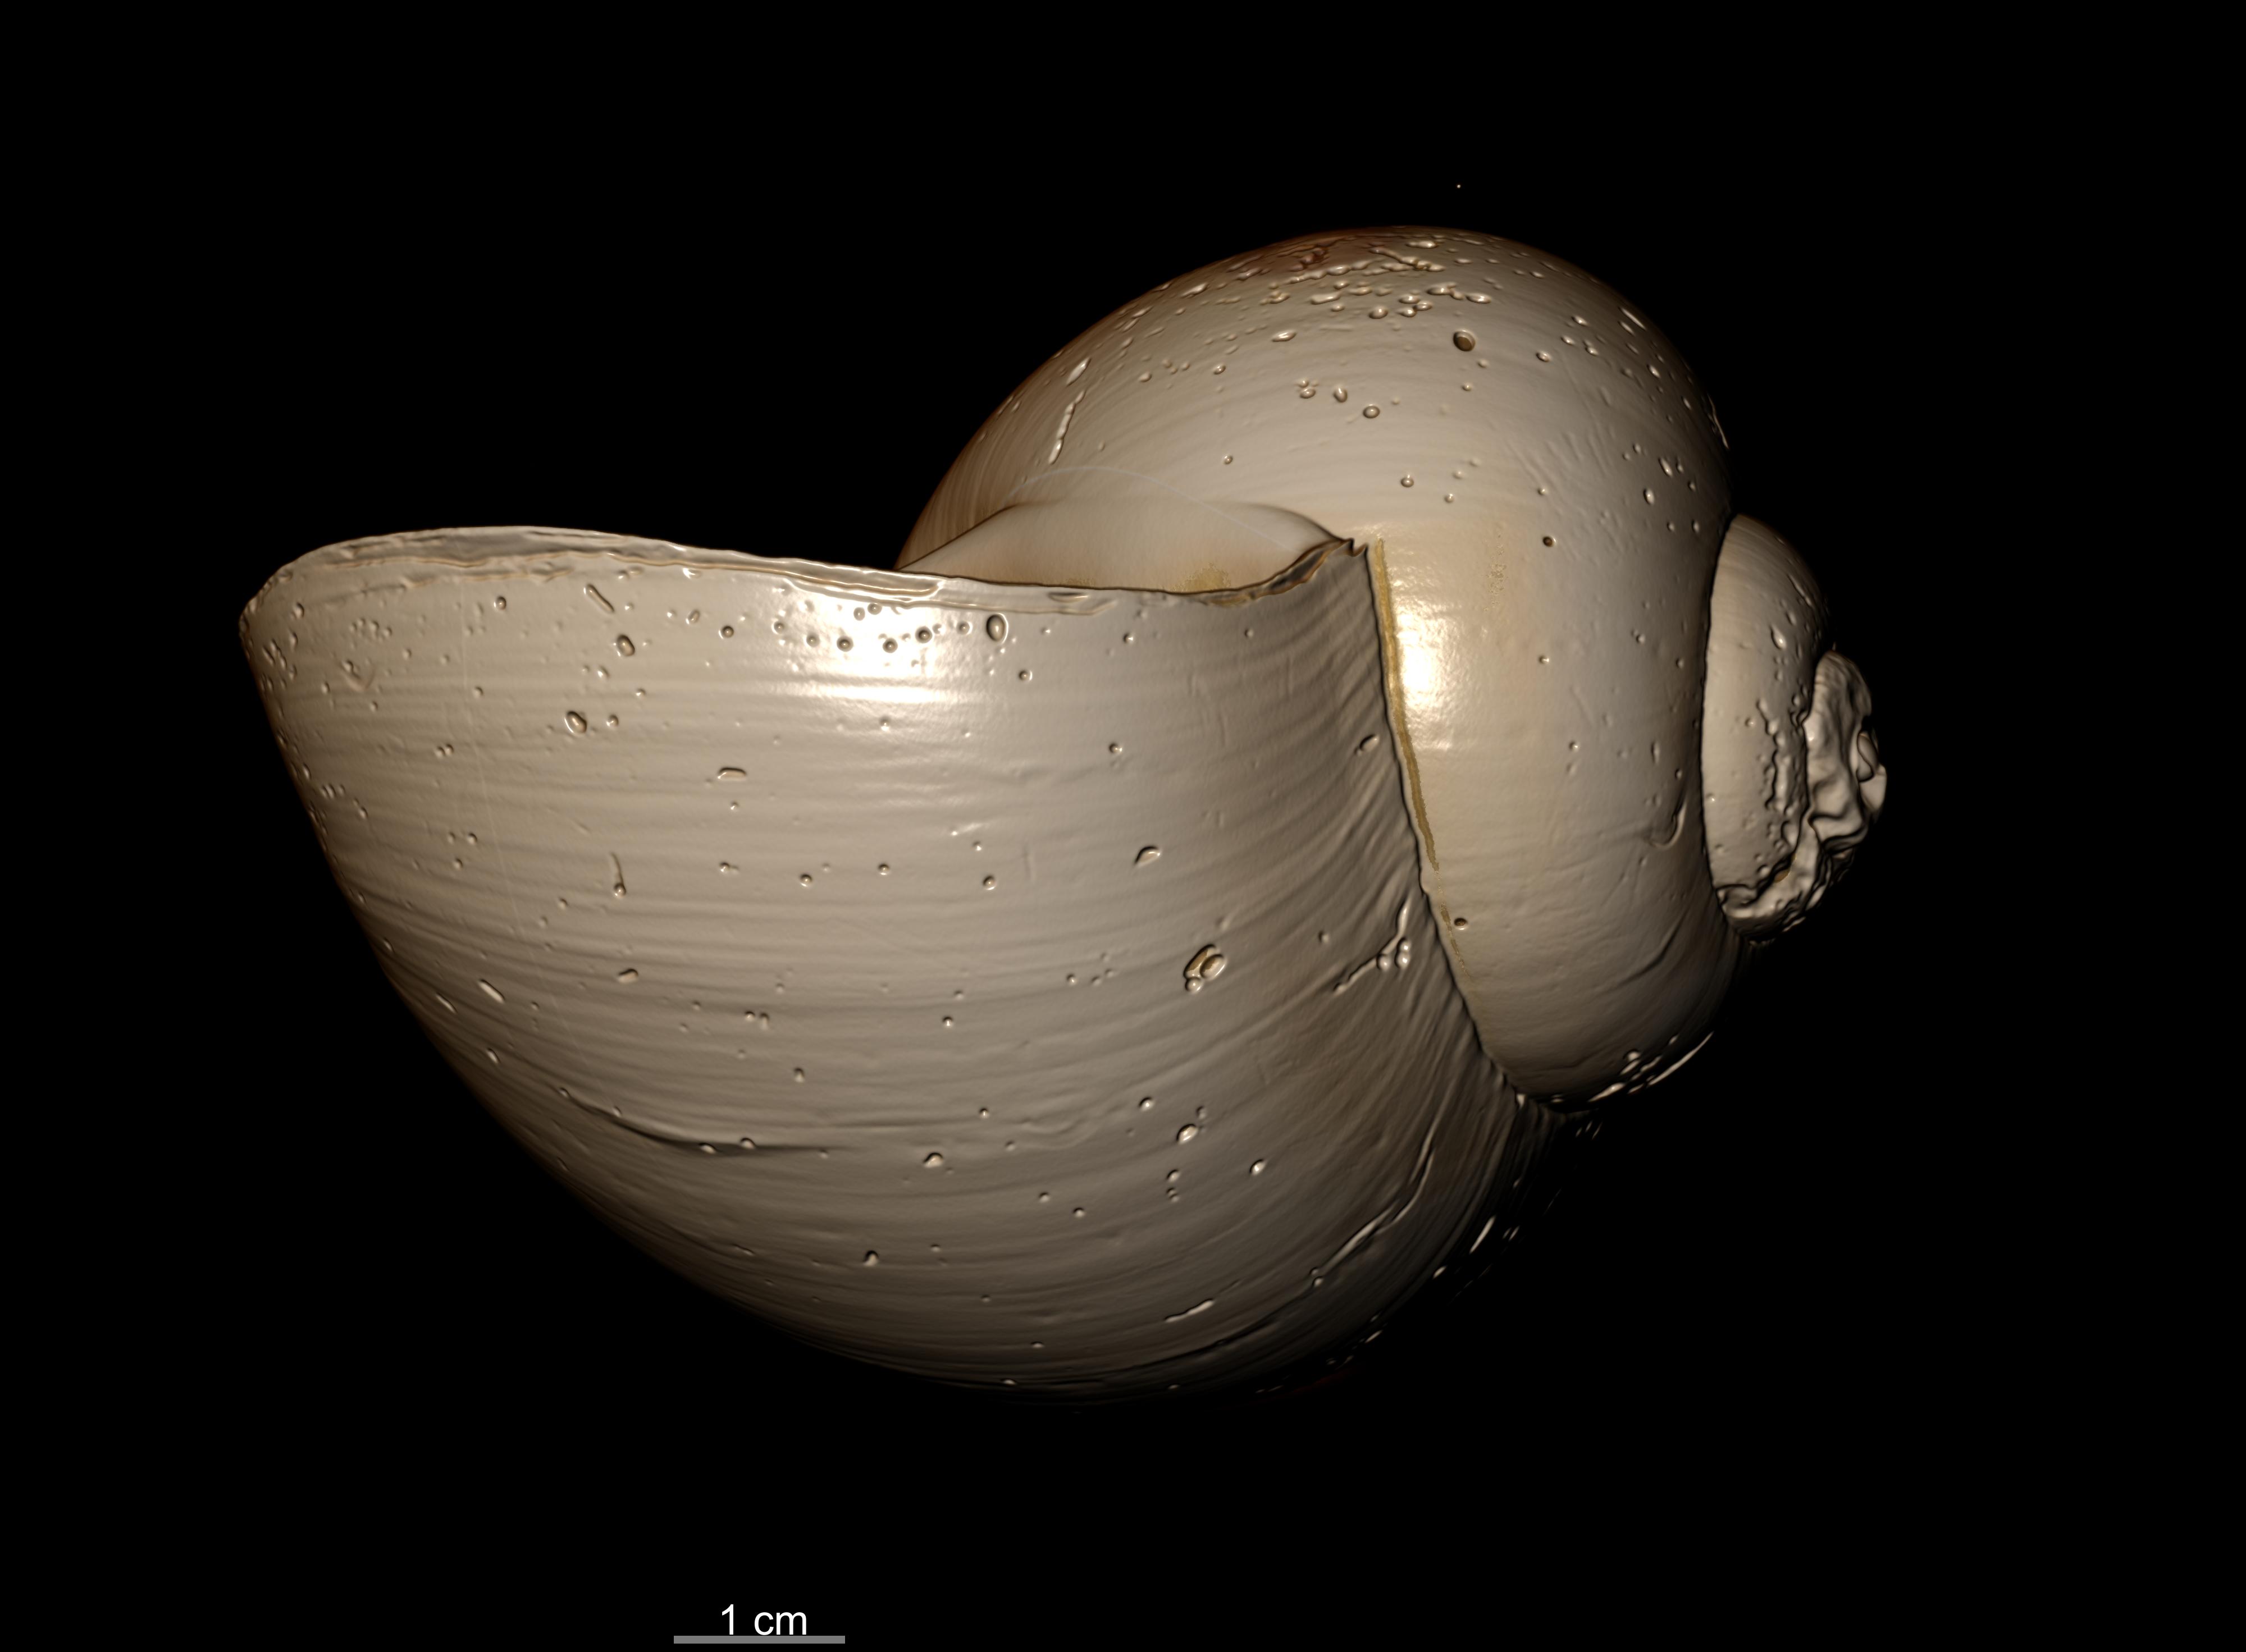 BE-RBINS-INV SYNTYPE MT.3849/4 Ampullaria puntaplaya bulk PROFILE MCT RX.jpg